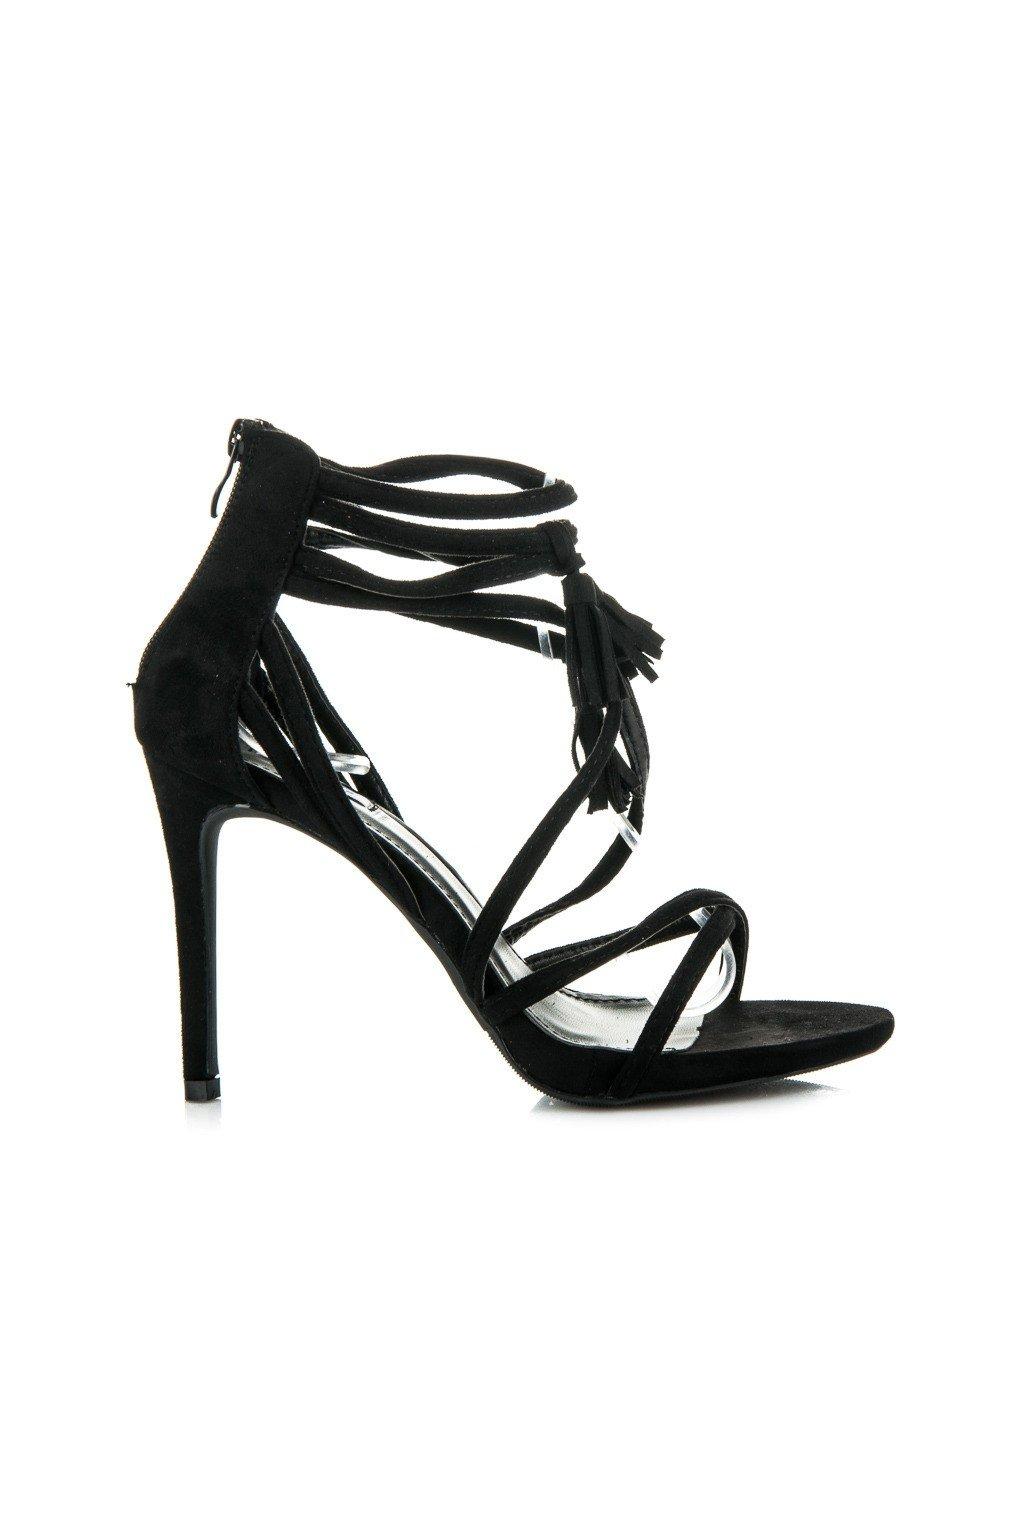 Čierne sandále BOHO 1249-1B